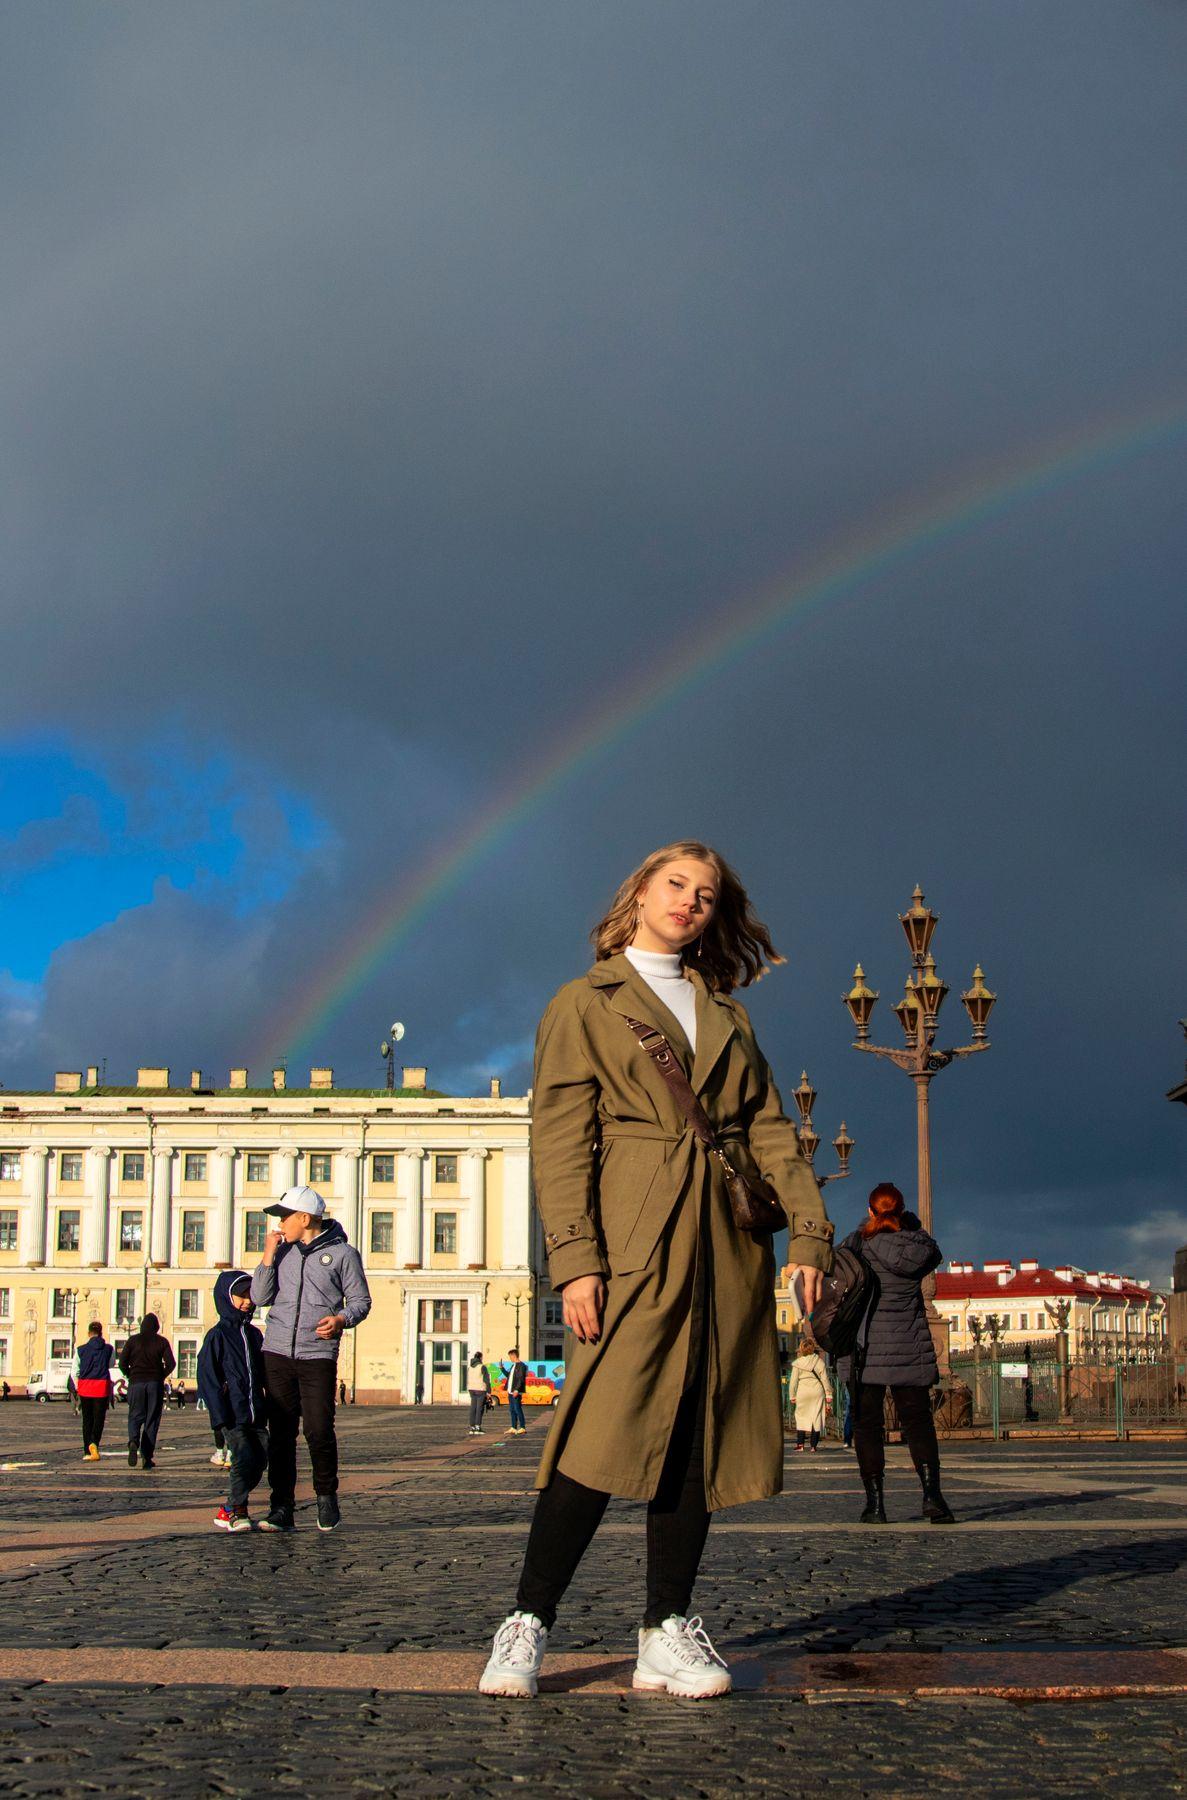 На Дворцовой площади 2 радуга девушка